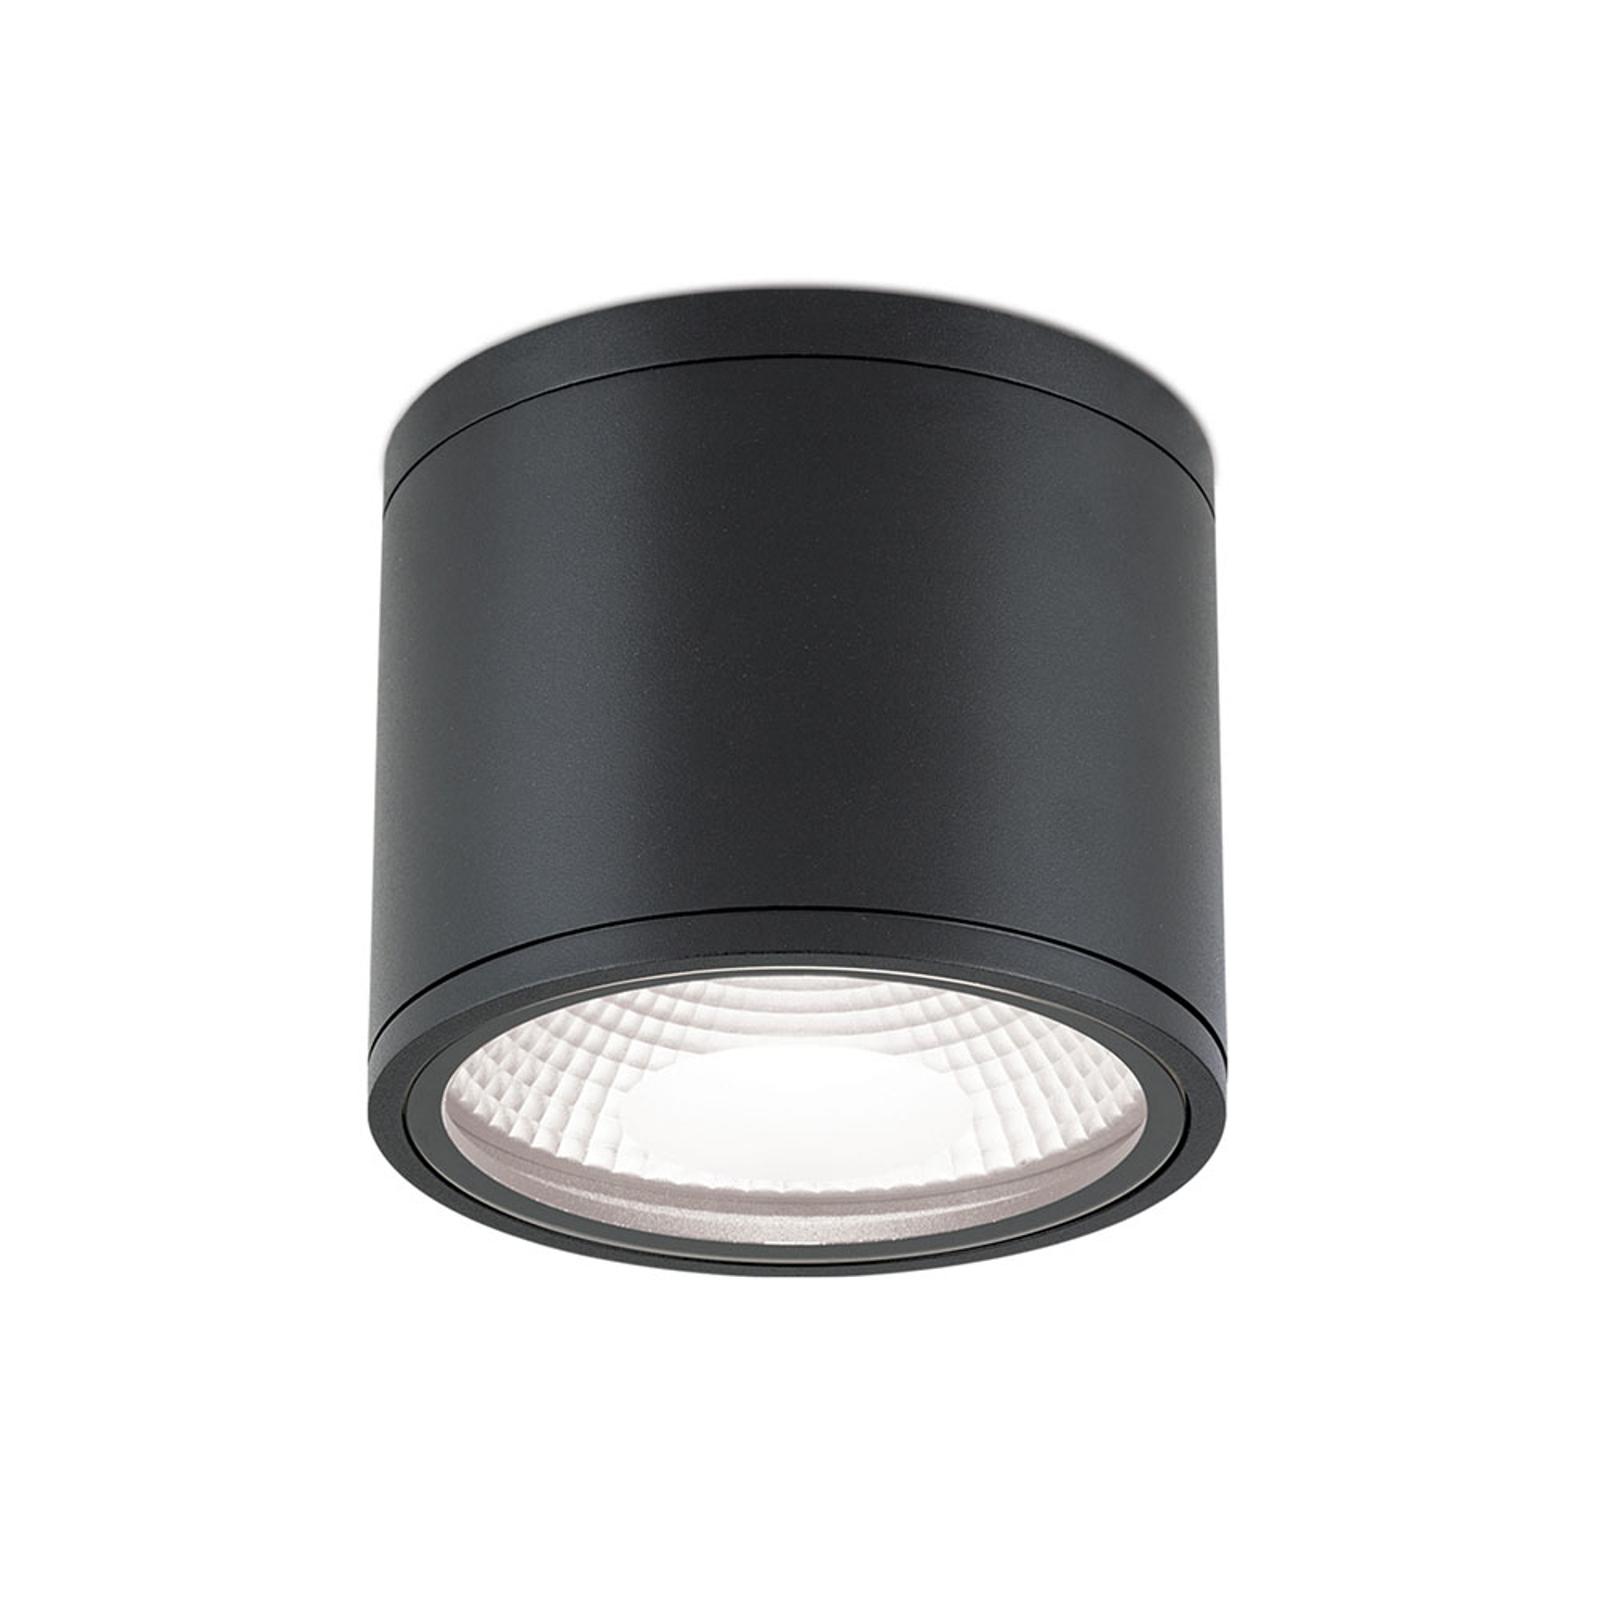 LED-kattovalaisin Sputnik IP65 Ø 14,5 cm musta